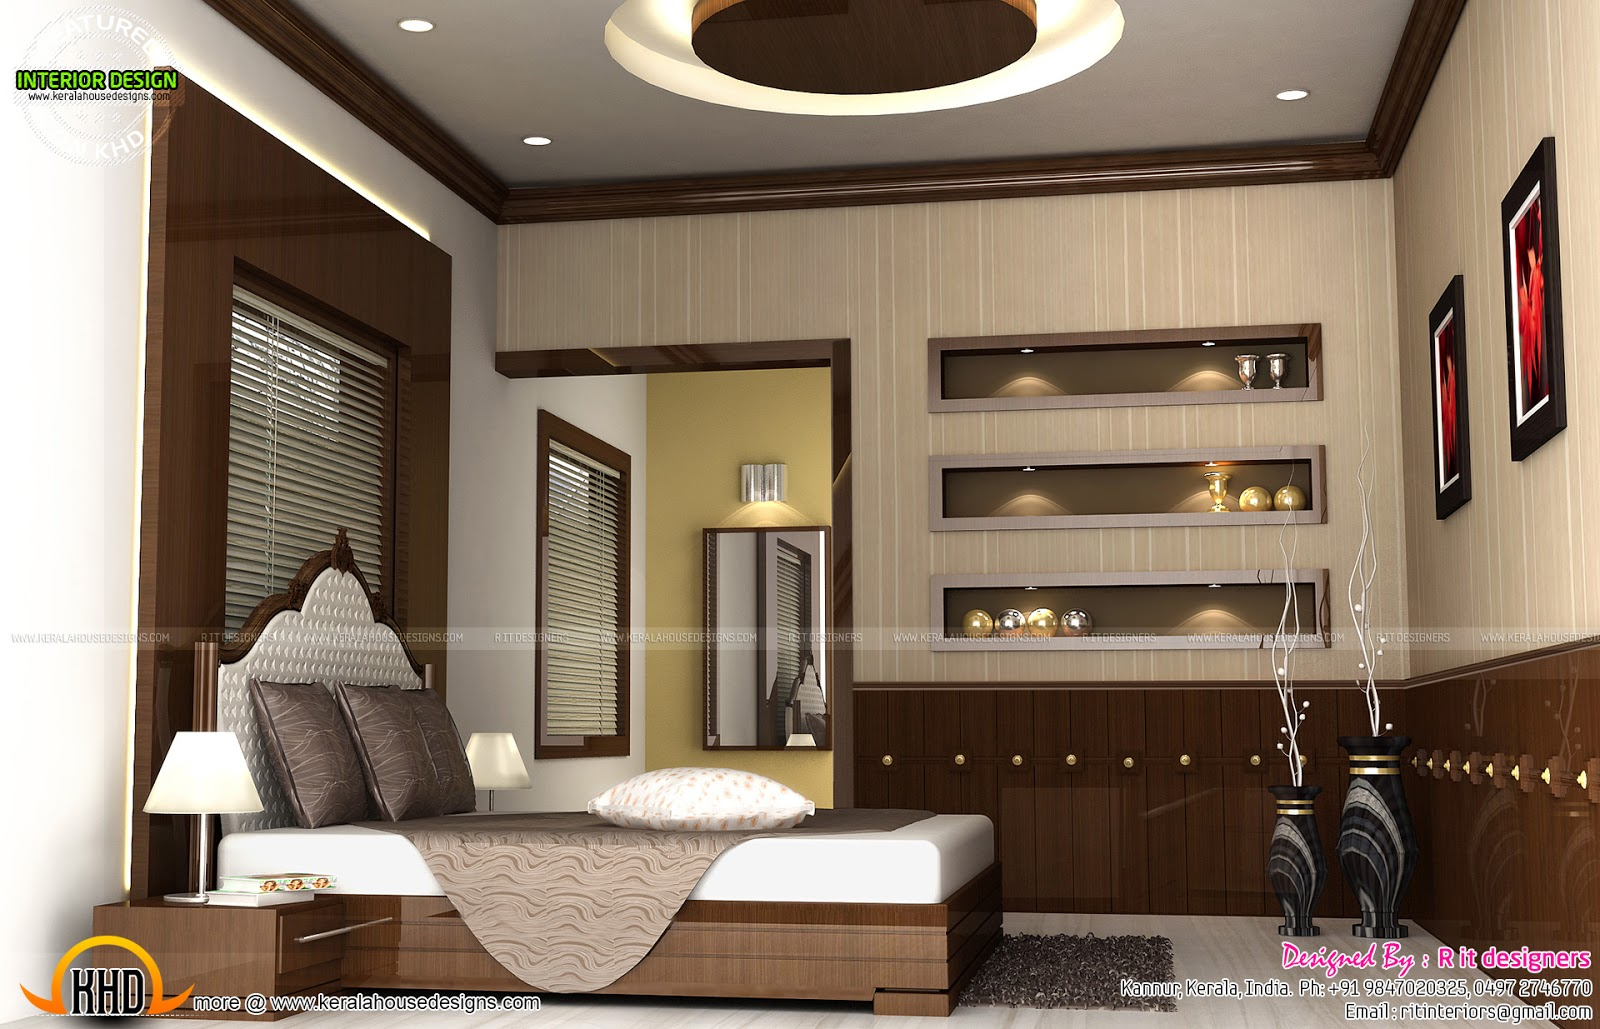 Modular kitchen, bedroom and staircase interior - Kerala ...